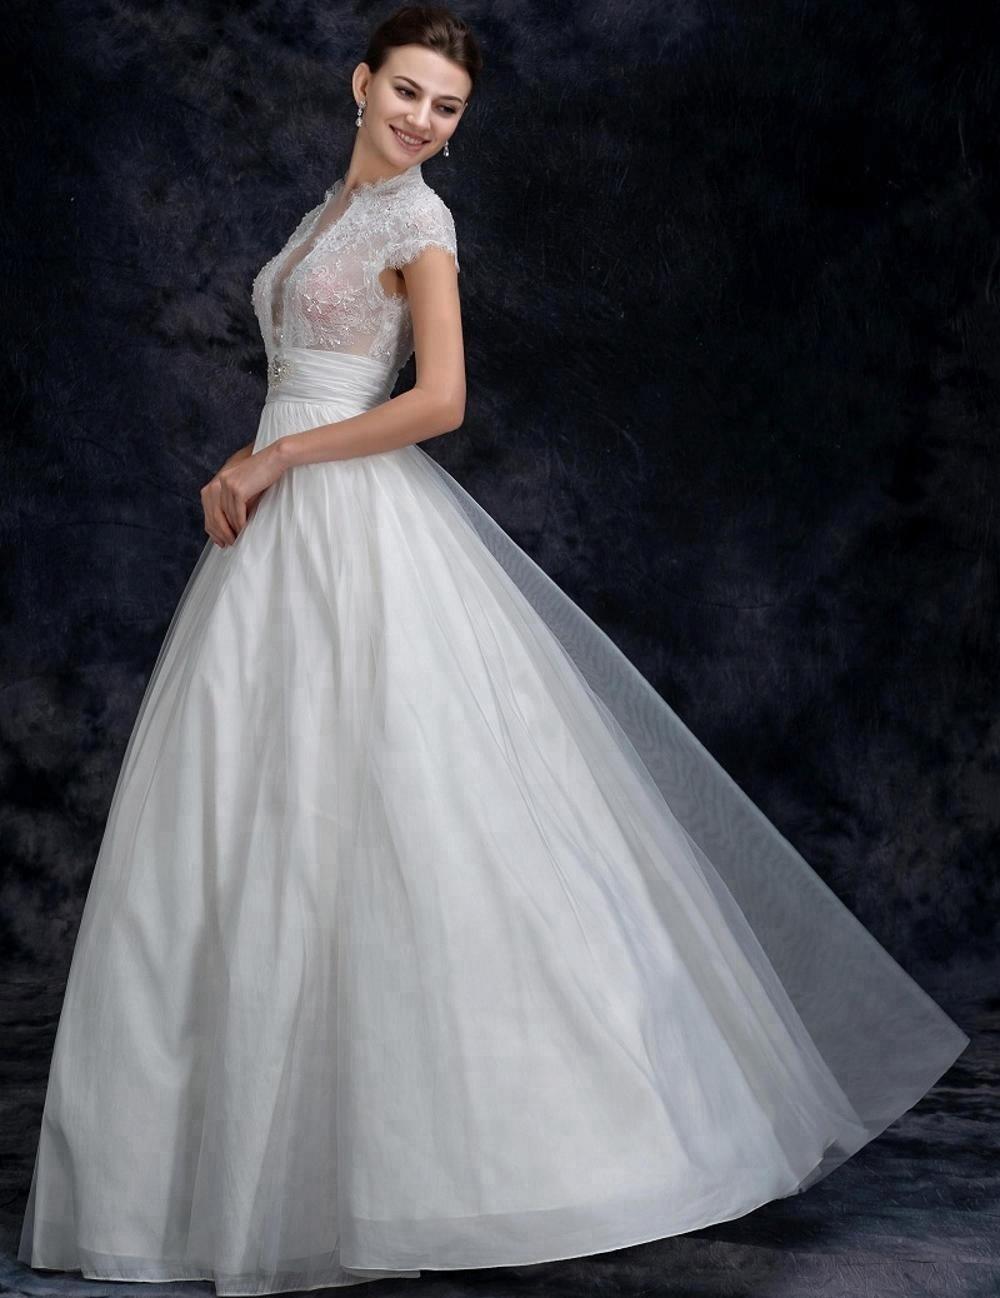 Wholesale ball gown halter bridal - Online Buy Best ball gown halter ...